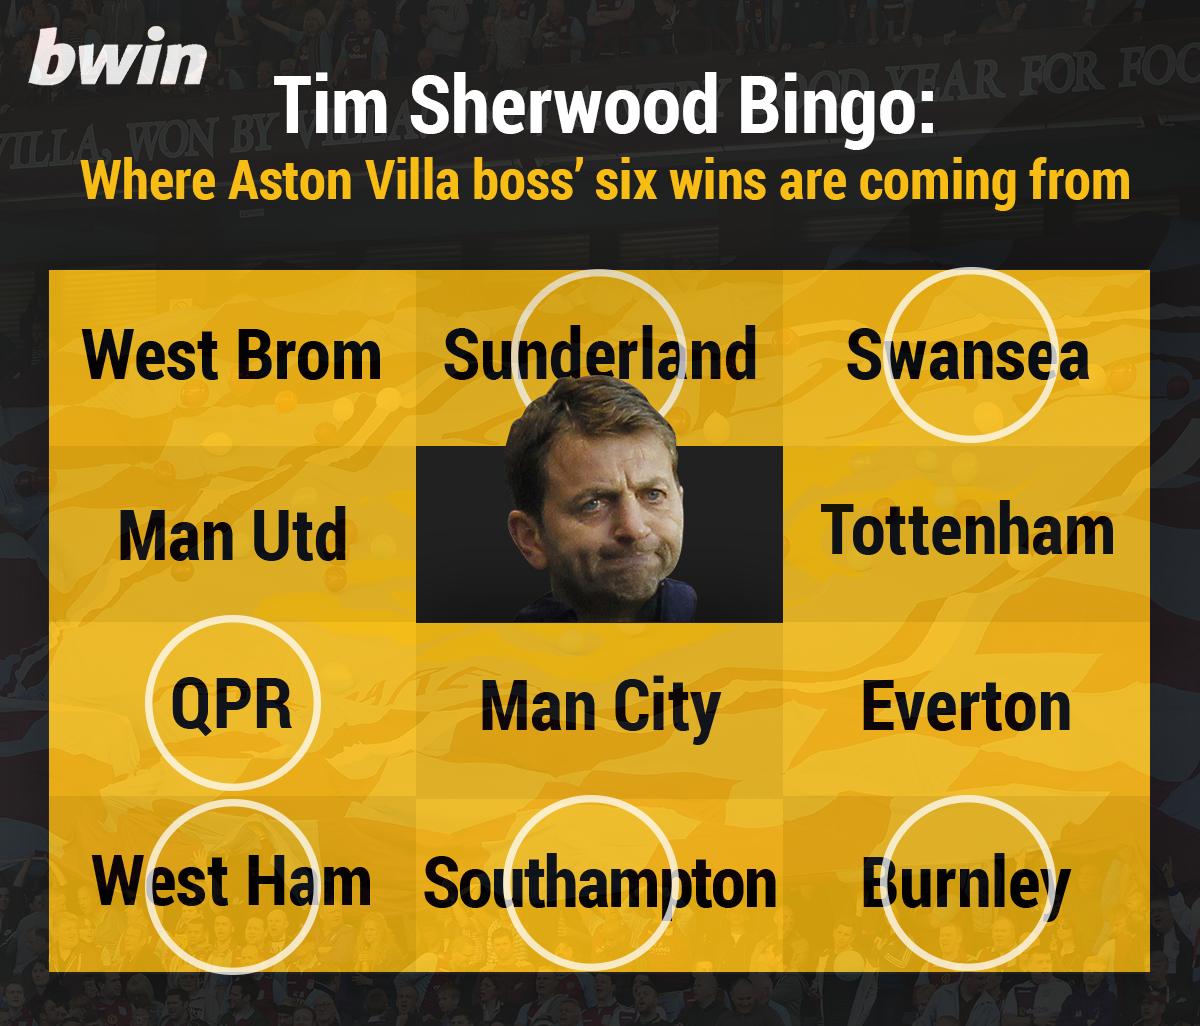 sherwood-bingo-2 (1)